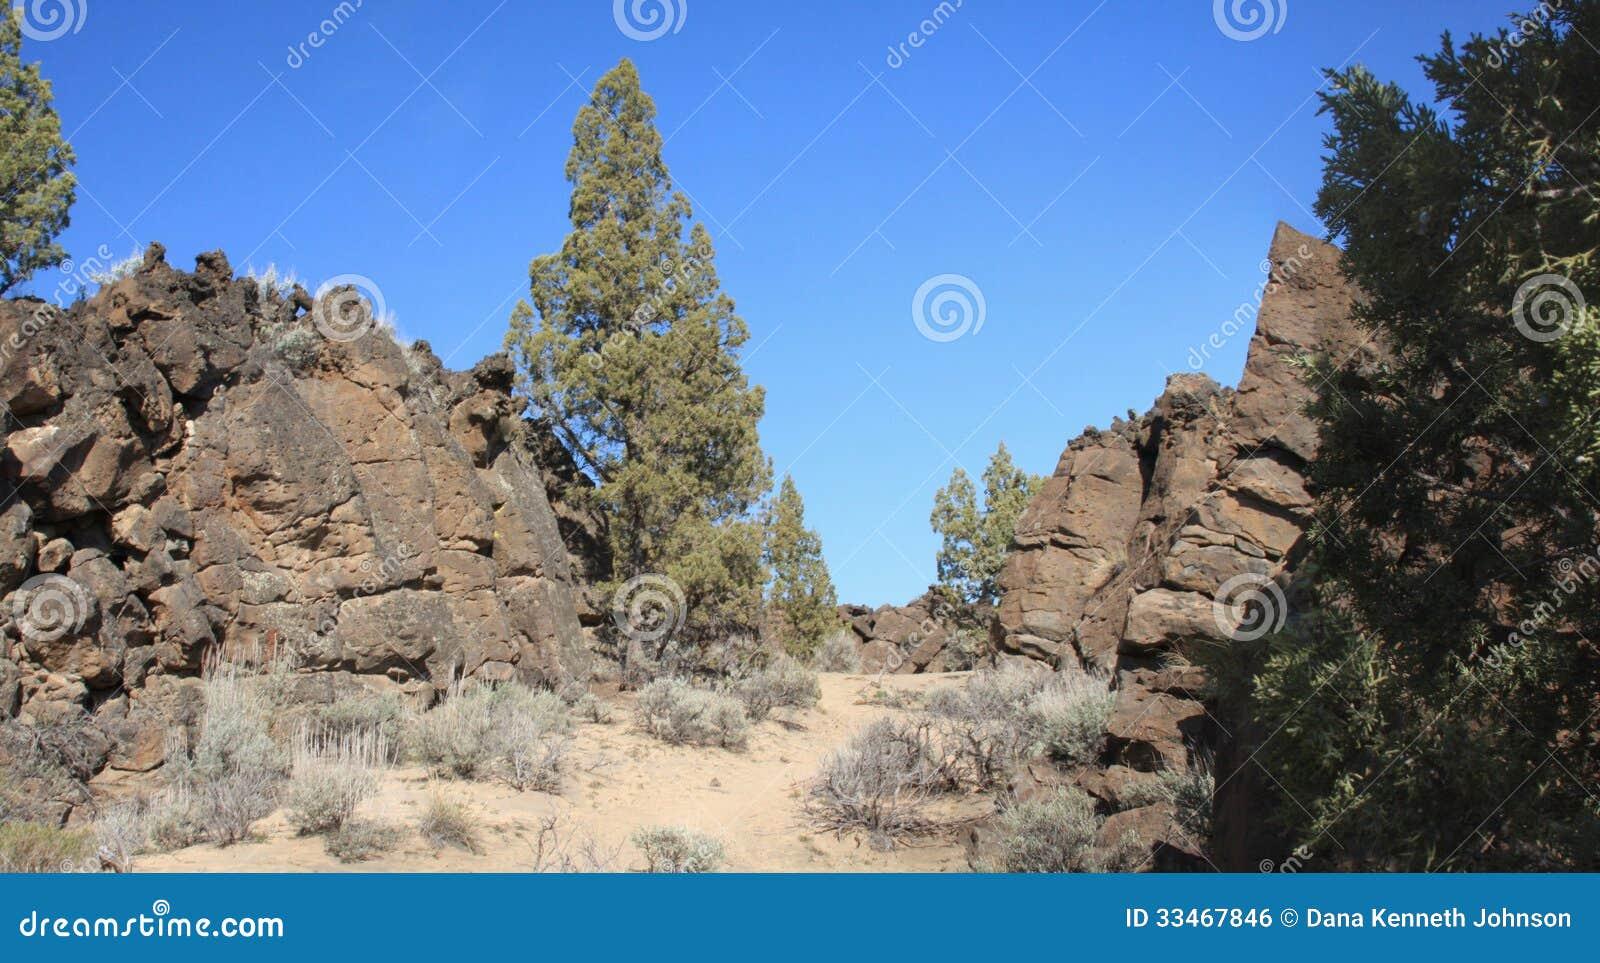 flatiron rock  central oregon badlands stock photo